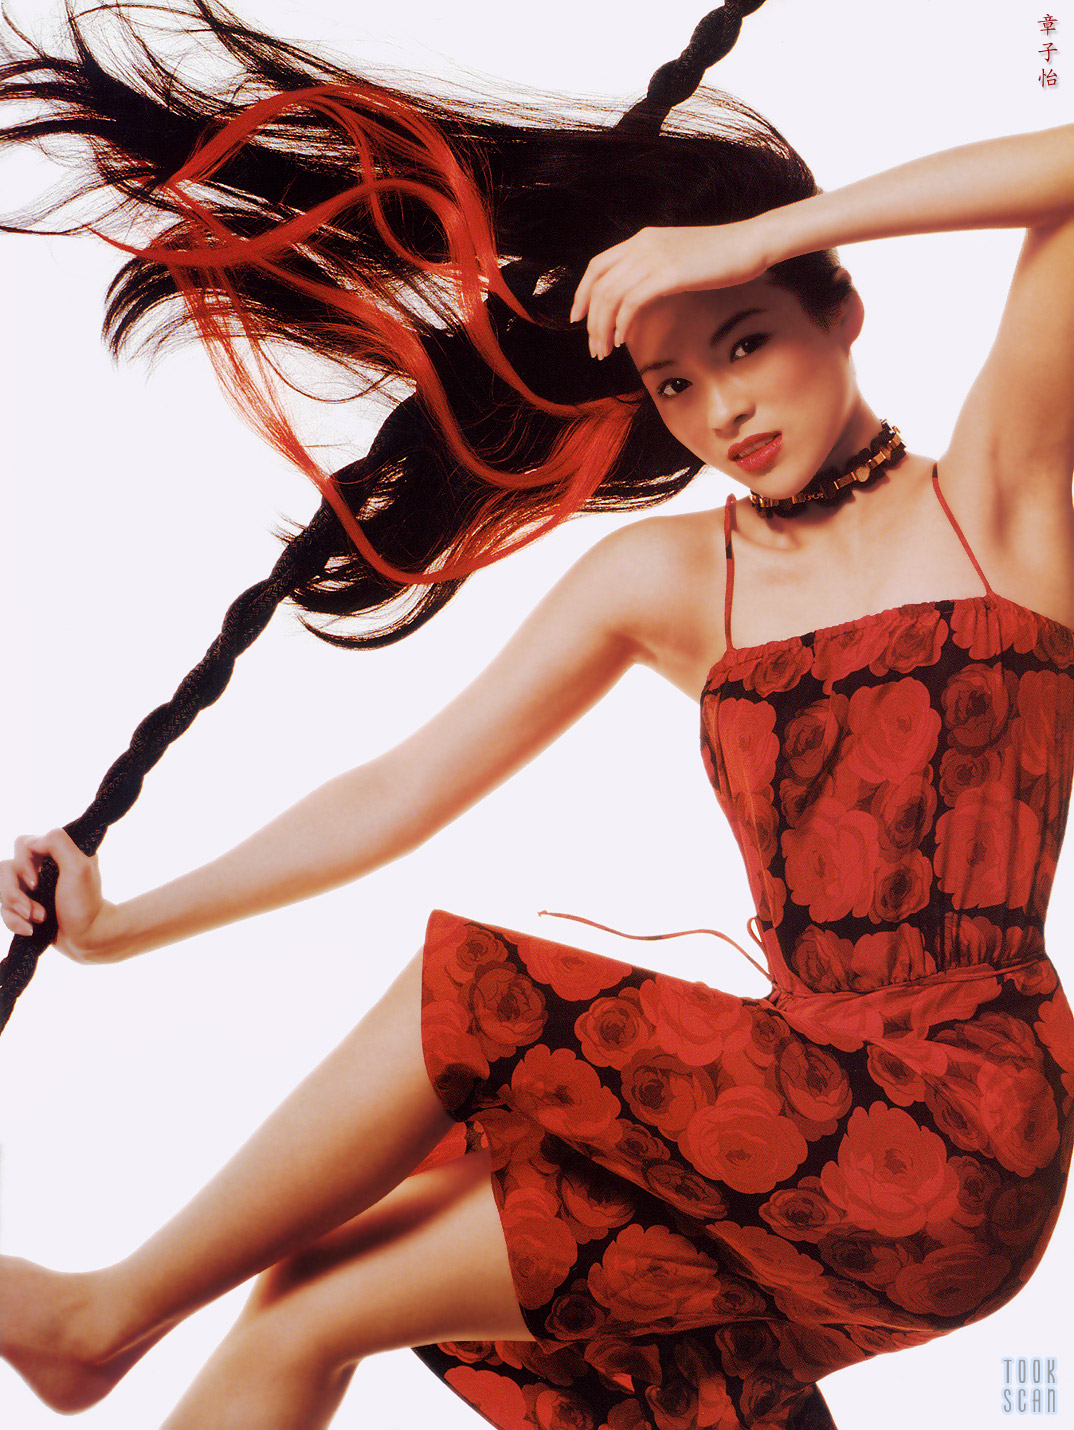 http://3.bp.blogspot.com/-0p0xbvFBJRs/TlqDm34zh_I/AAAAAAAAAKY/aWJx9_QzvEM/s1600/Ziyi-Zhang-Hot-Pics-Hub-+%25281%2529.jpg